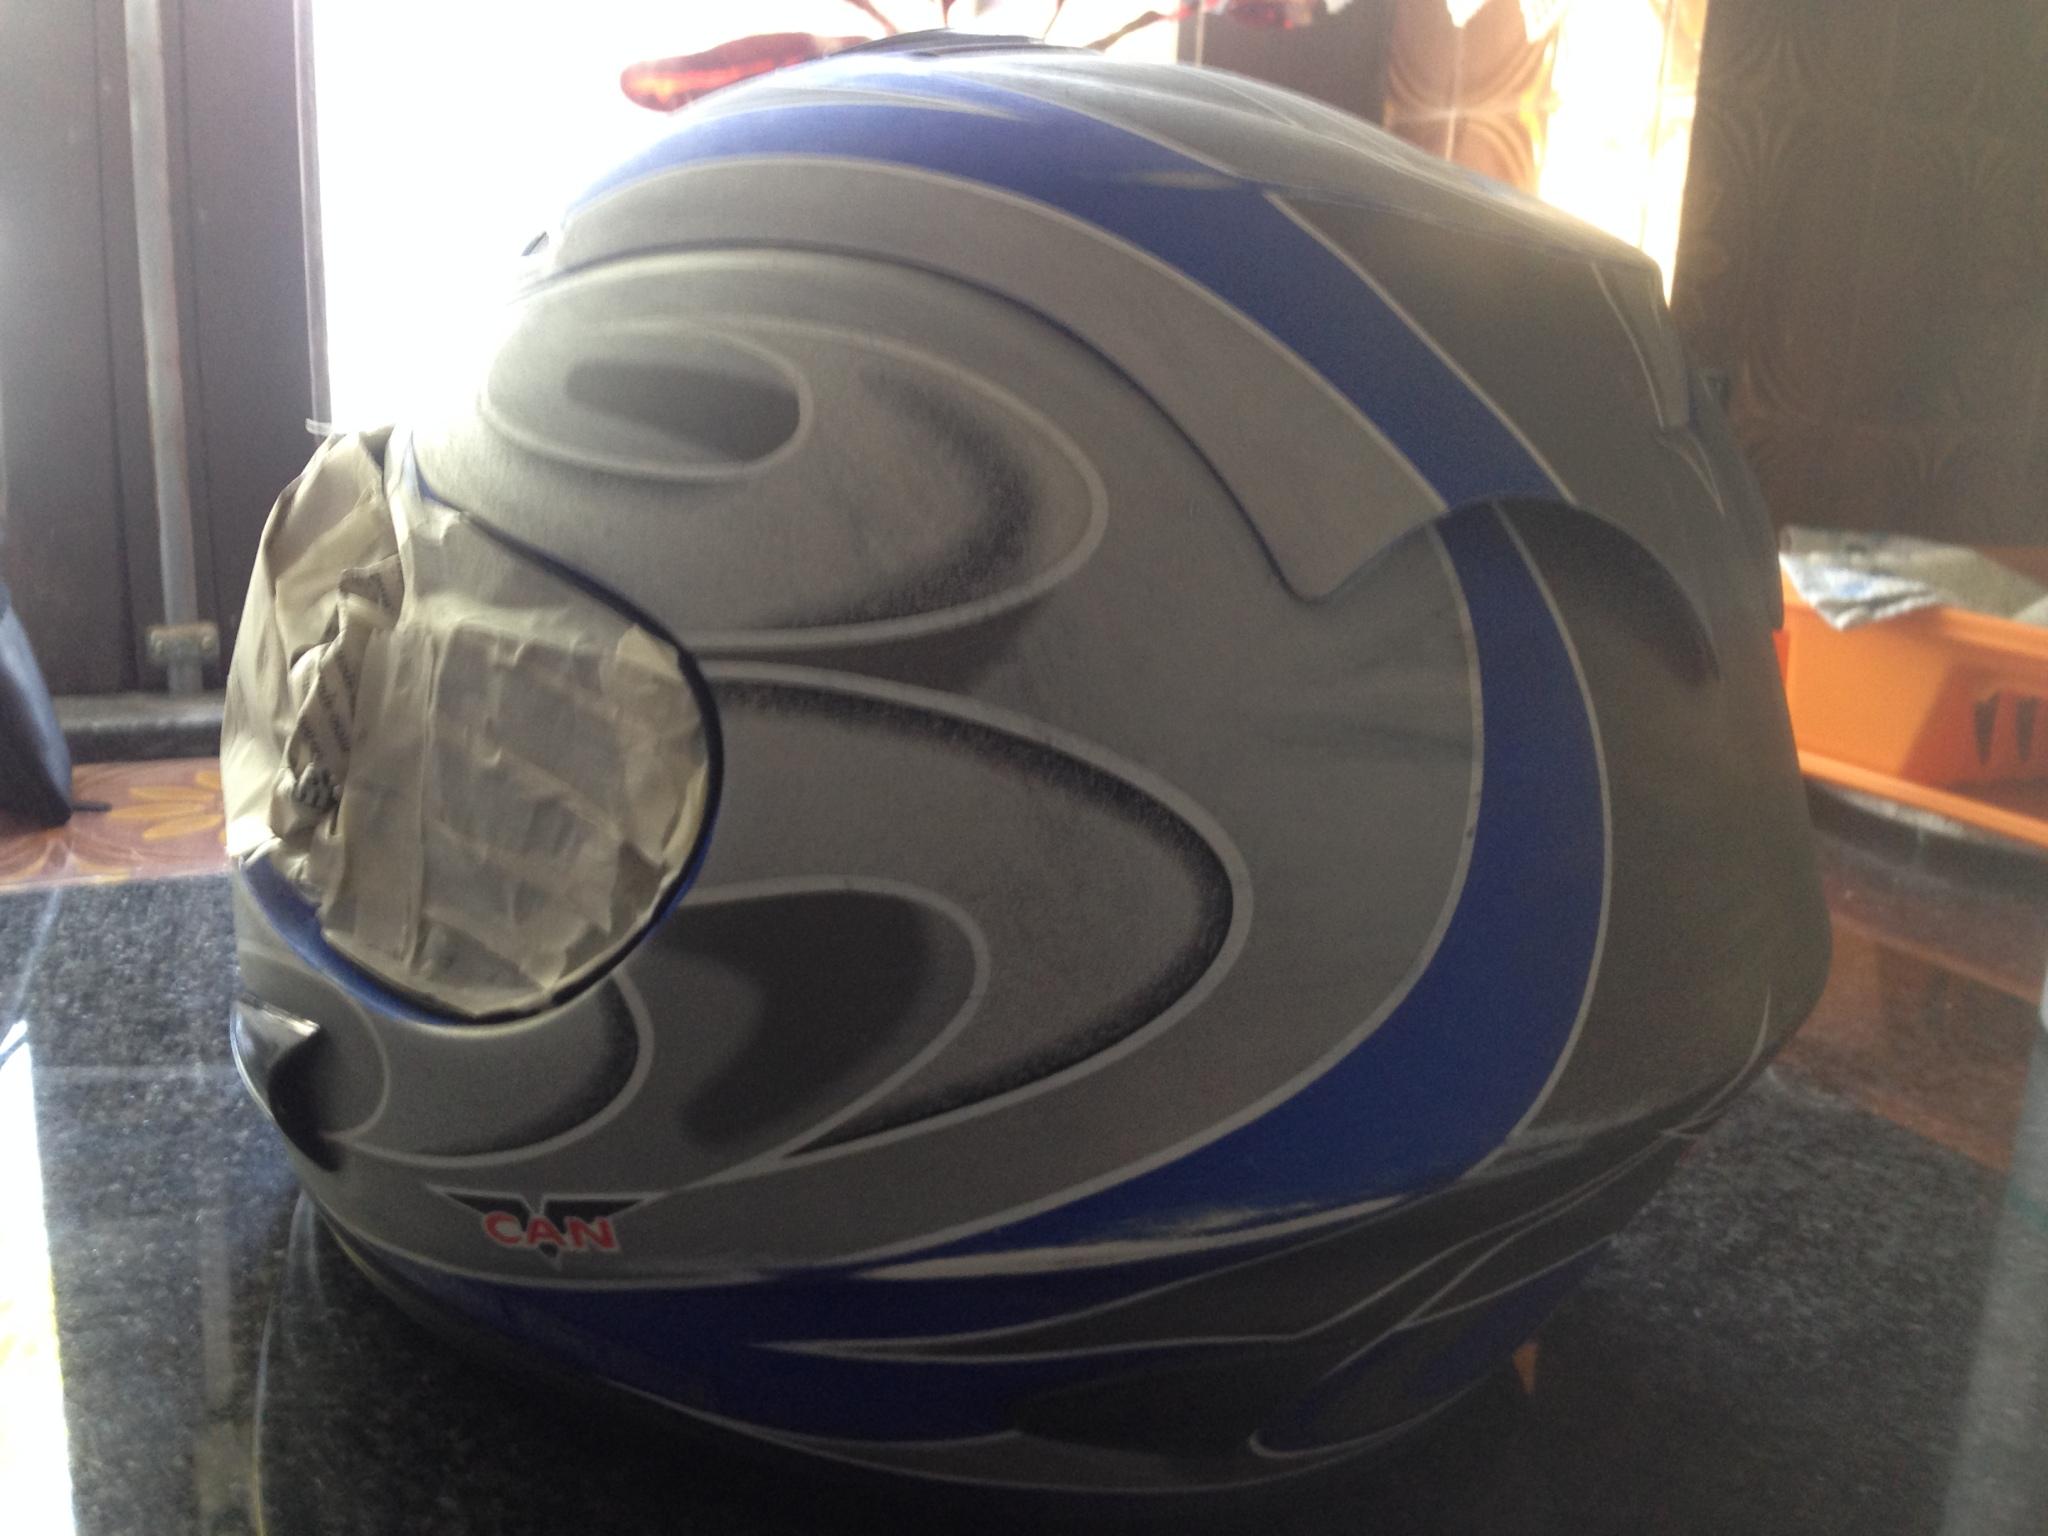 Autocolantes na moto/capacete  Vhsuok